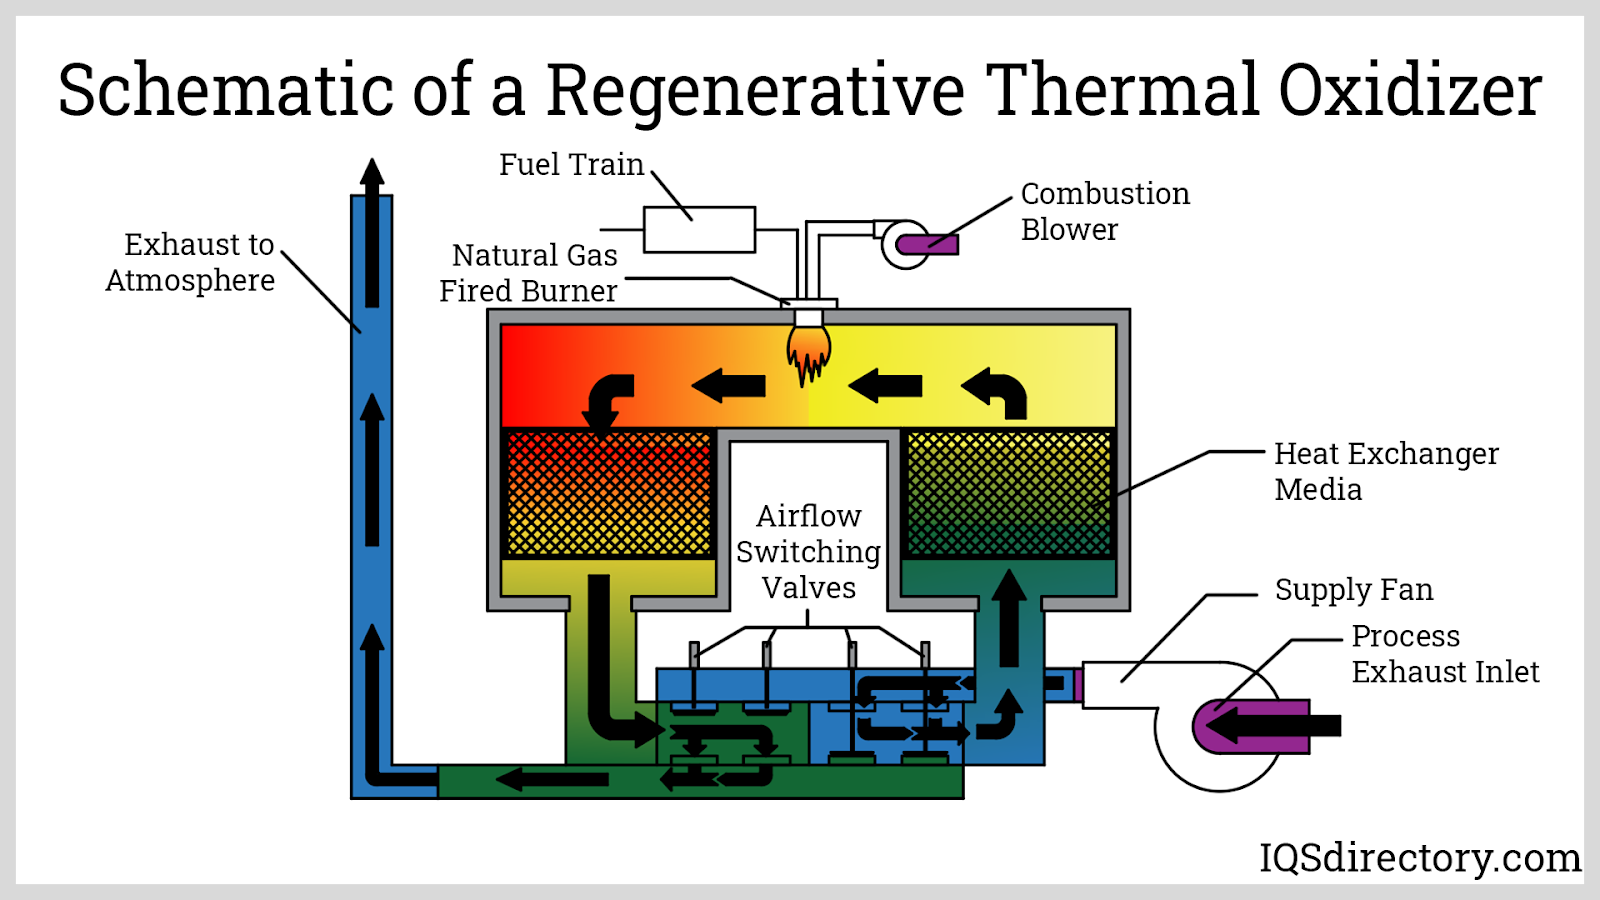 Schematic of a Regenerative Thermal Oxidizer